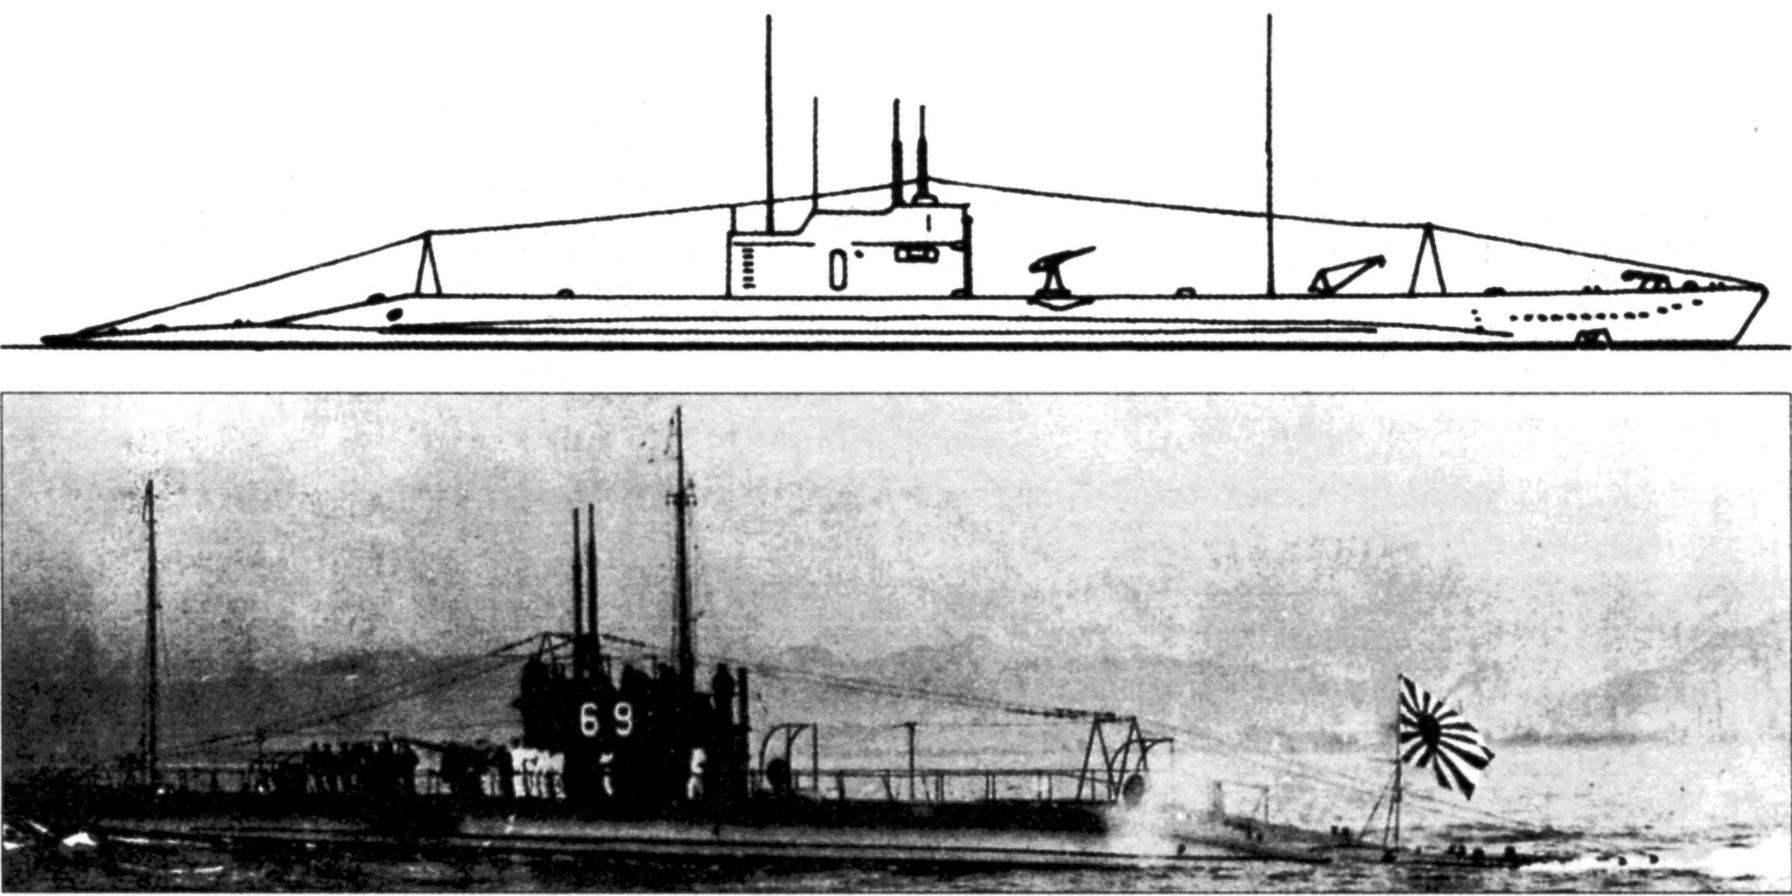 Подводная лодка №68 («I-52») типа «КТ», Япония, 1923 г.